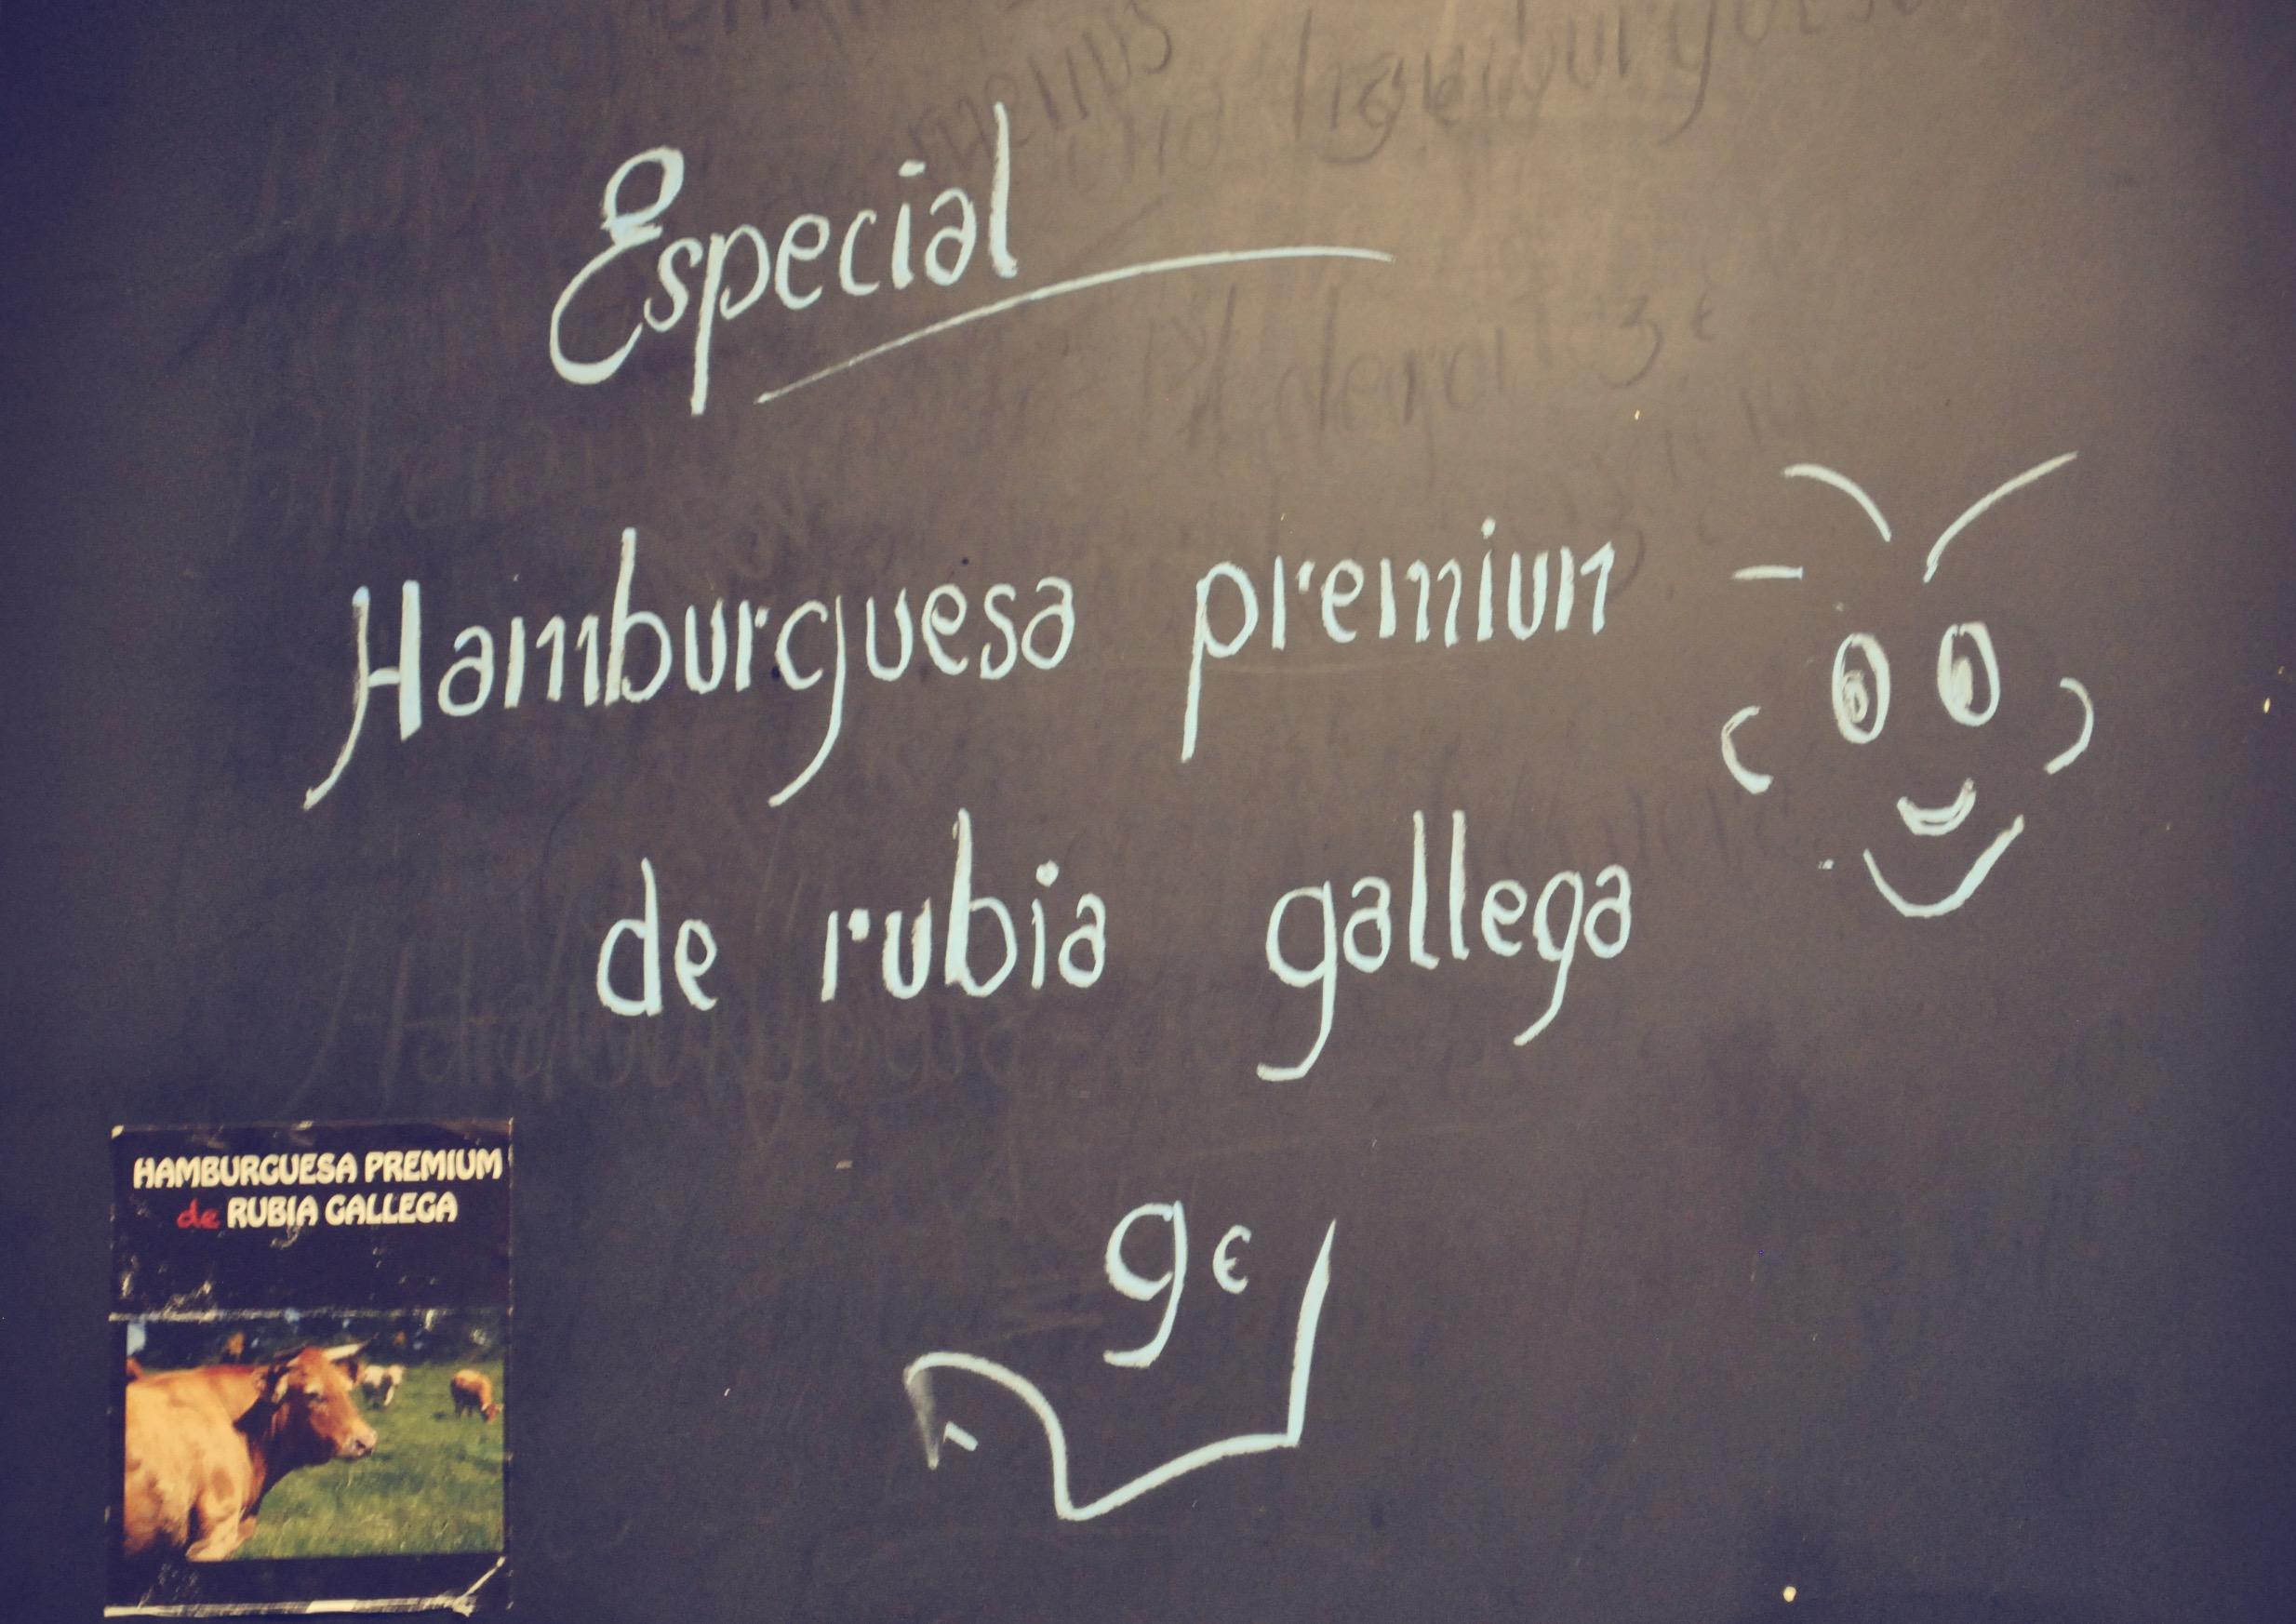 hamburguesa_rubiagallega.jpg